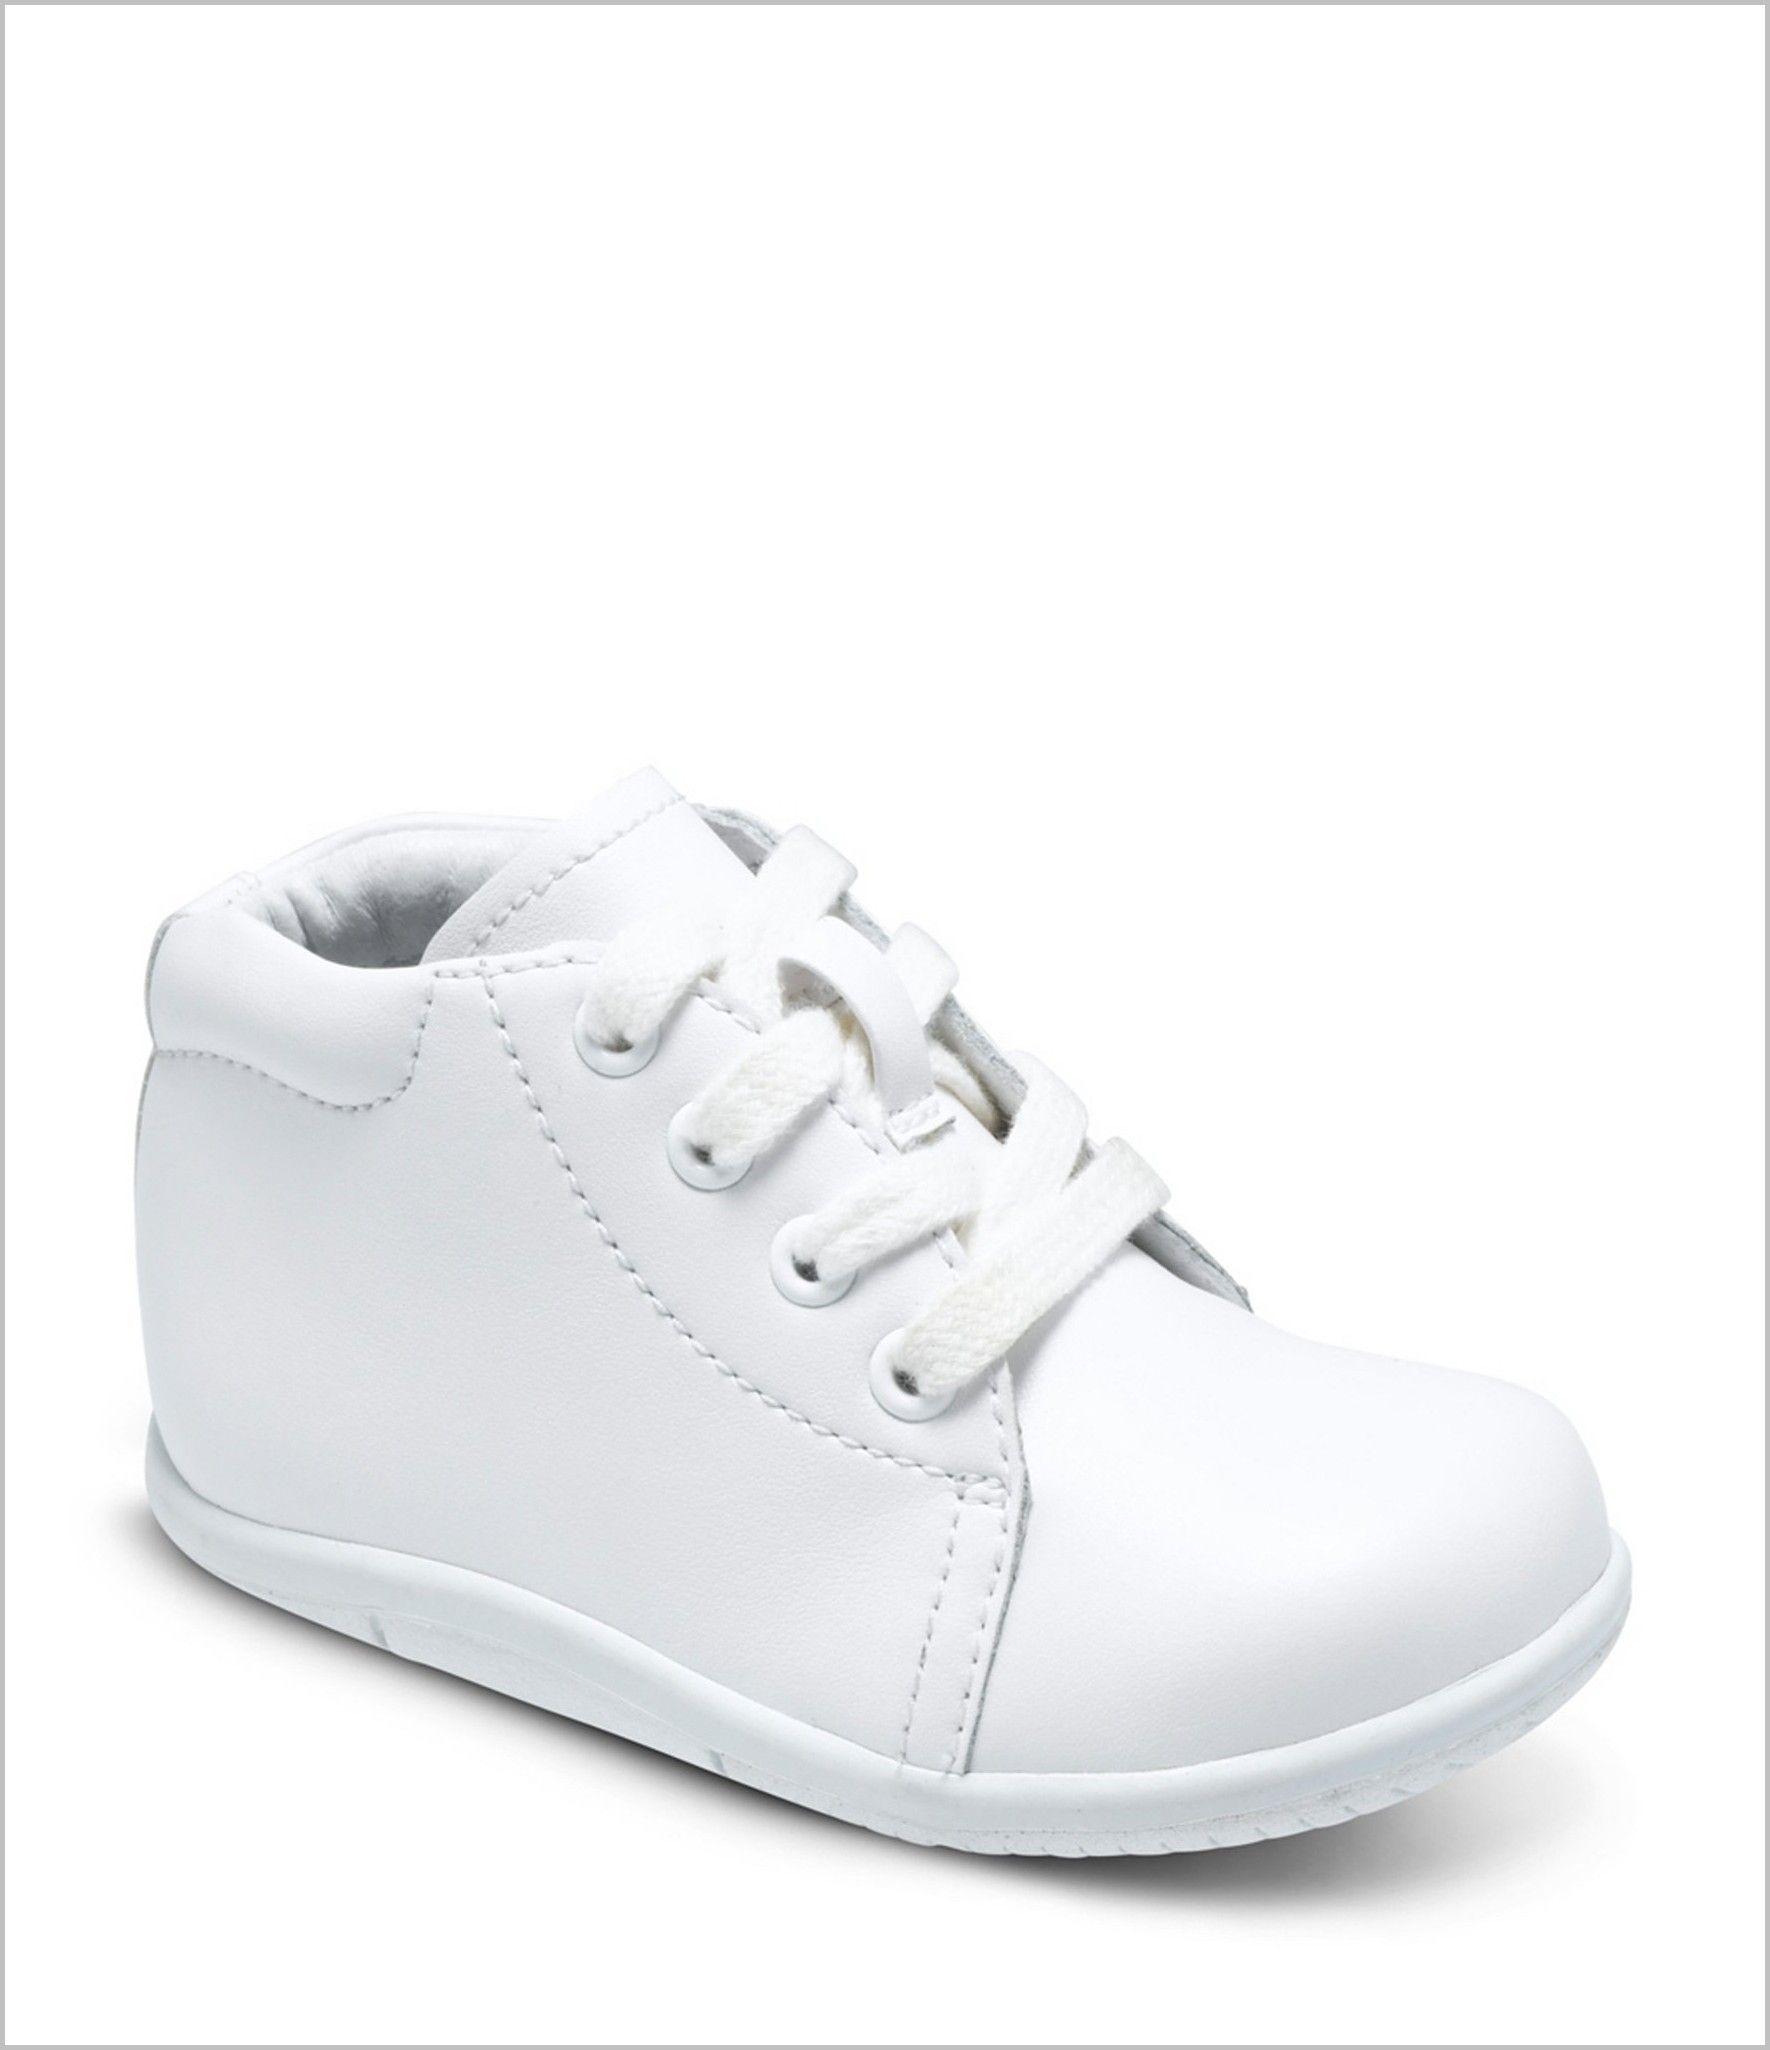 Baby walking shoes, Baby shoe storage